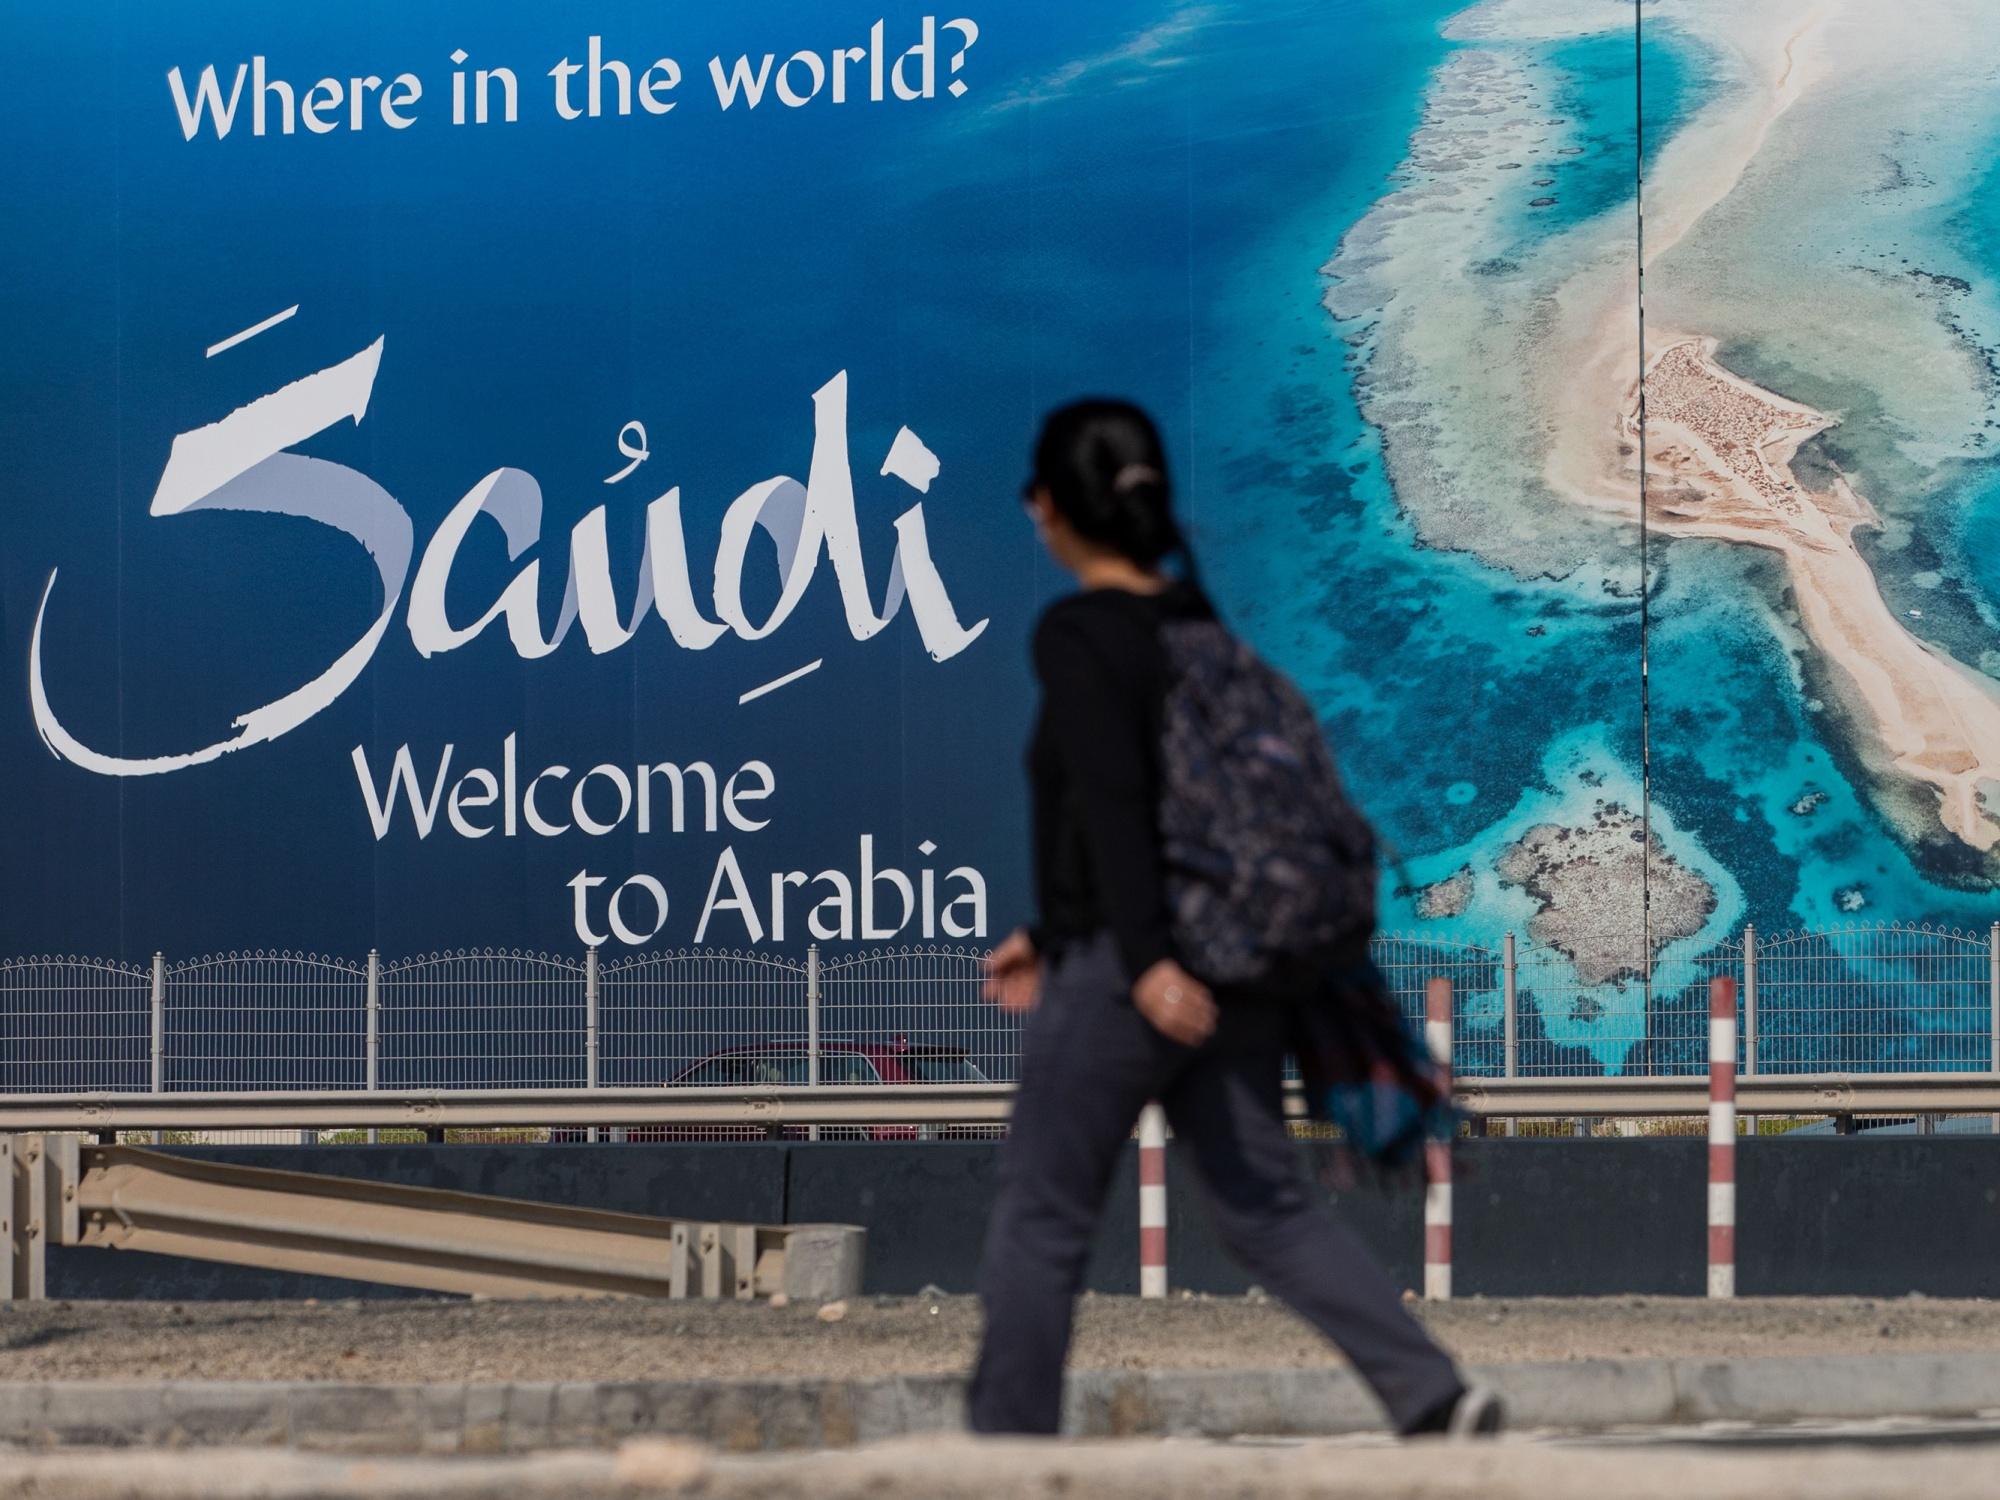 Saudi Arabia Advertises Tourism to Help Lower Unemployment